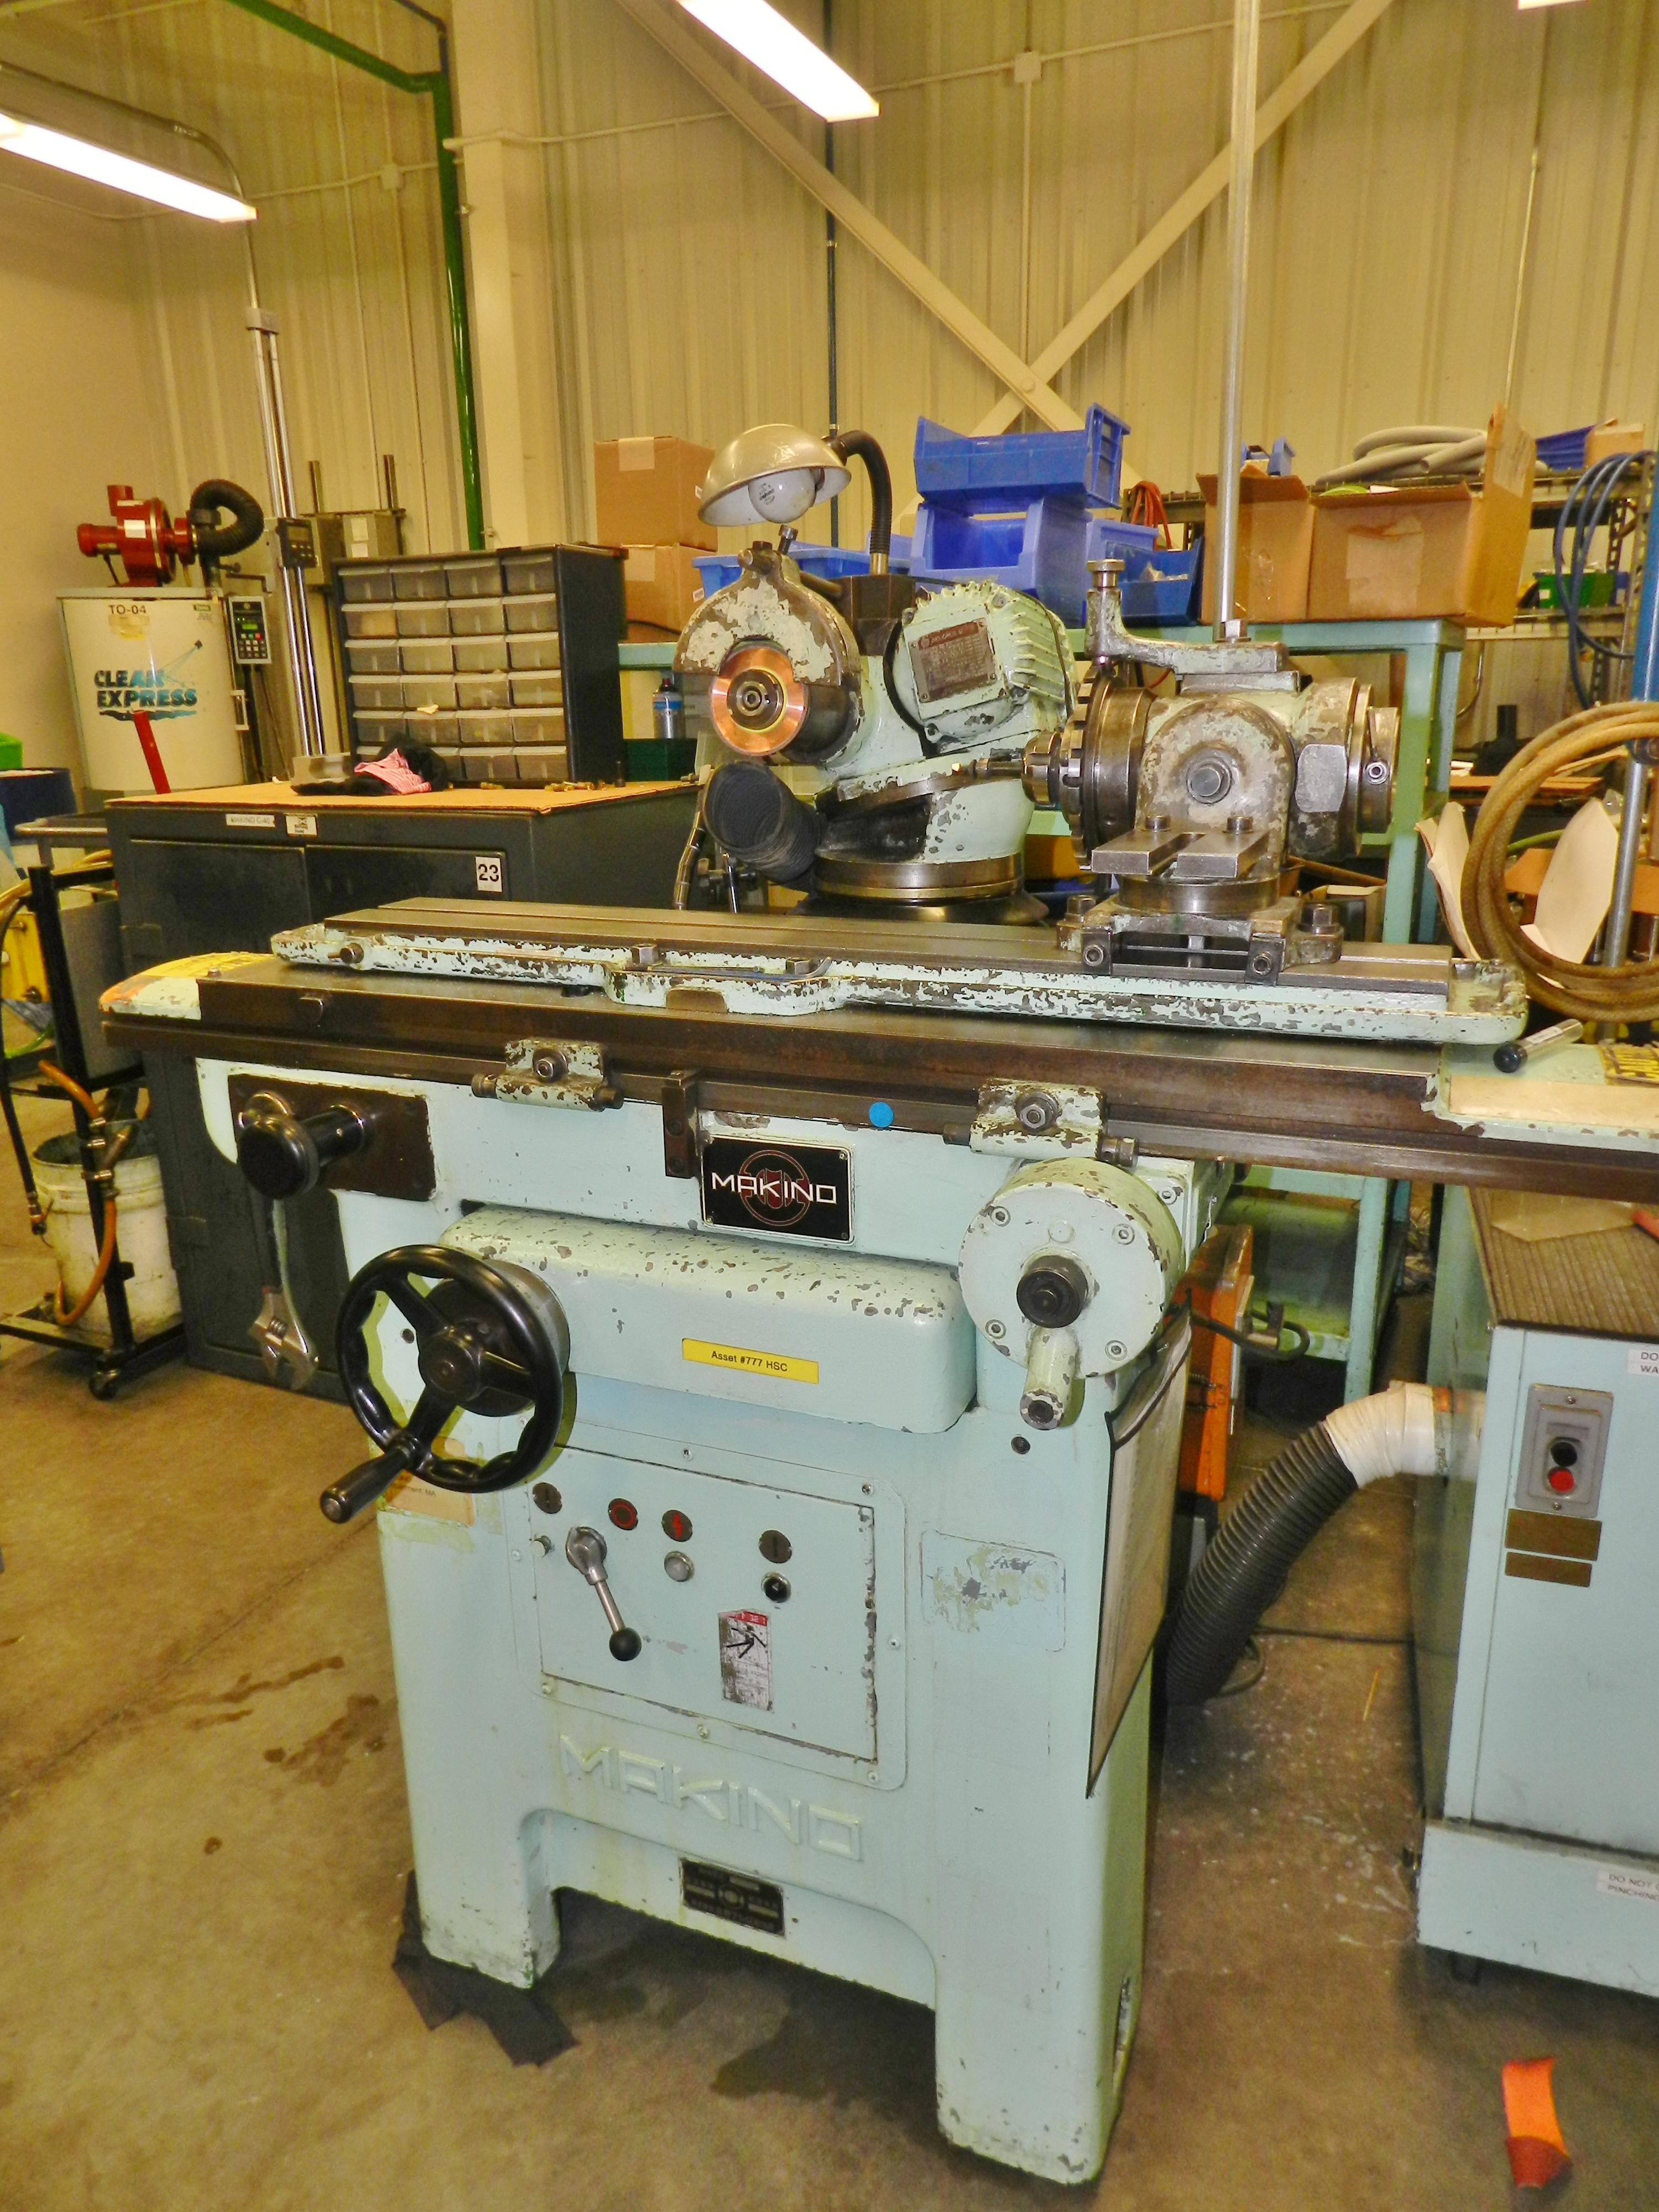 Lot 53 - Makino C-40 Universal Tool & Cutter Grinder